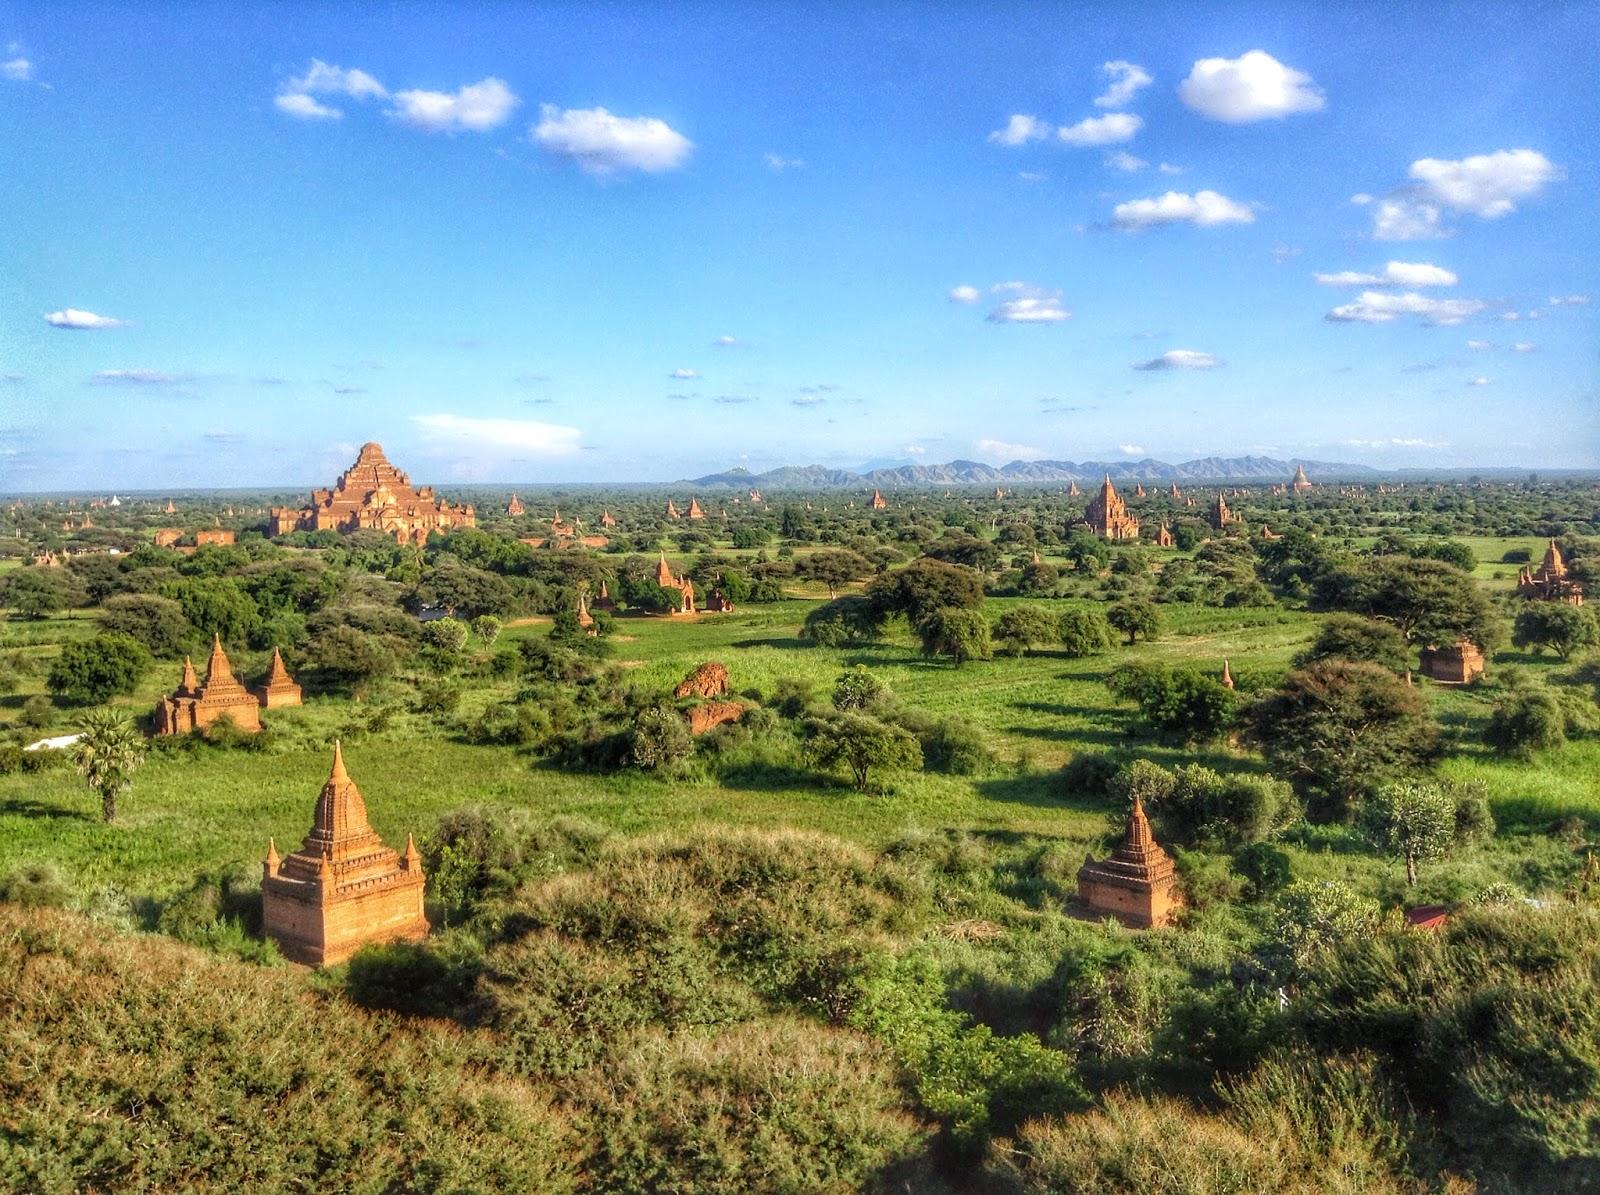 Shwe-san-daw - Sunset Pagoda Bagan